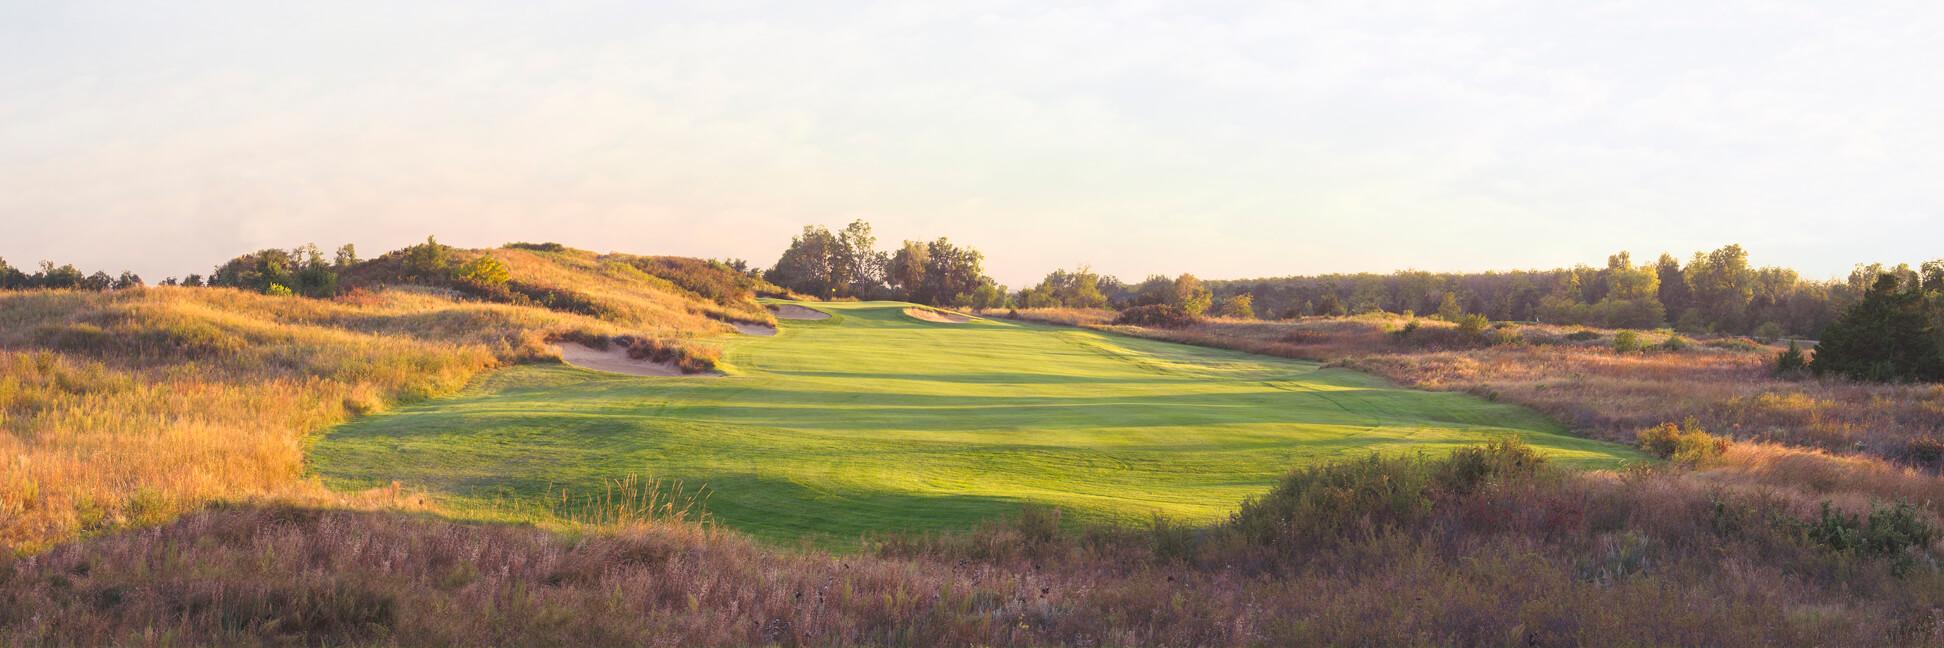 Golf Course Image - Prairie Dunes Country Club No. 5